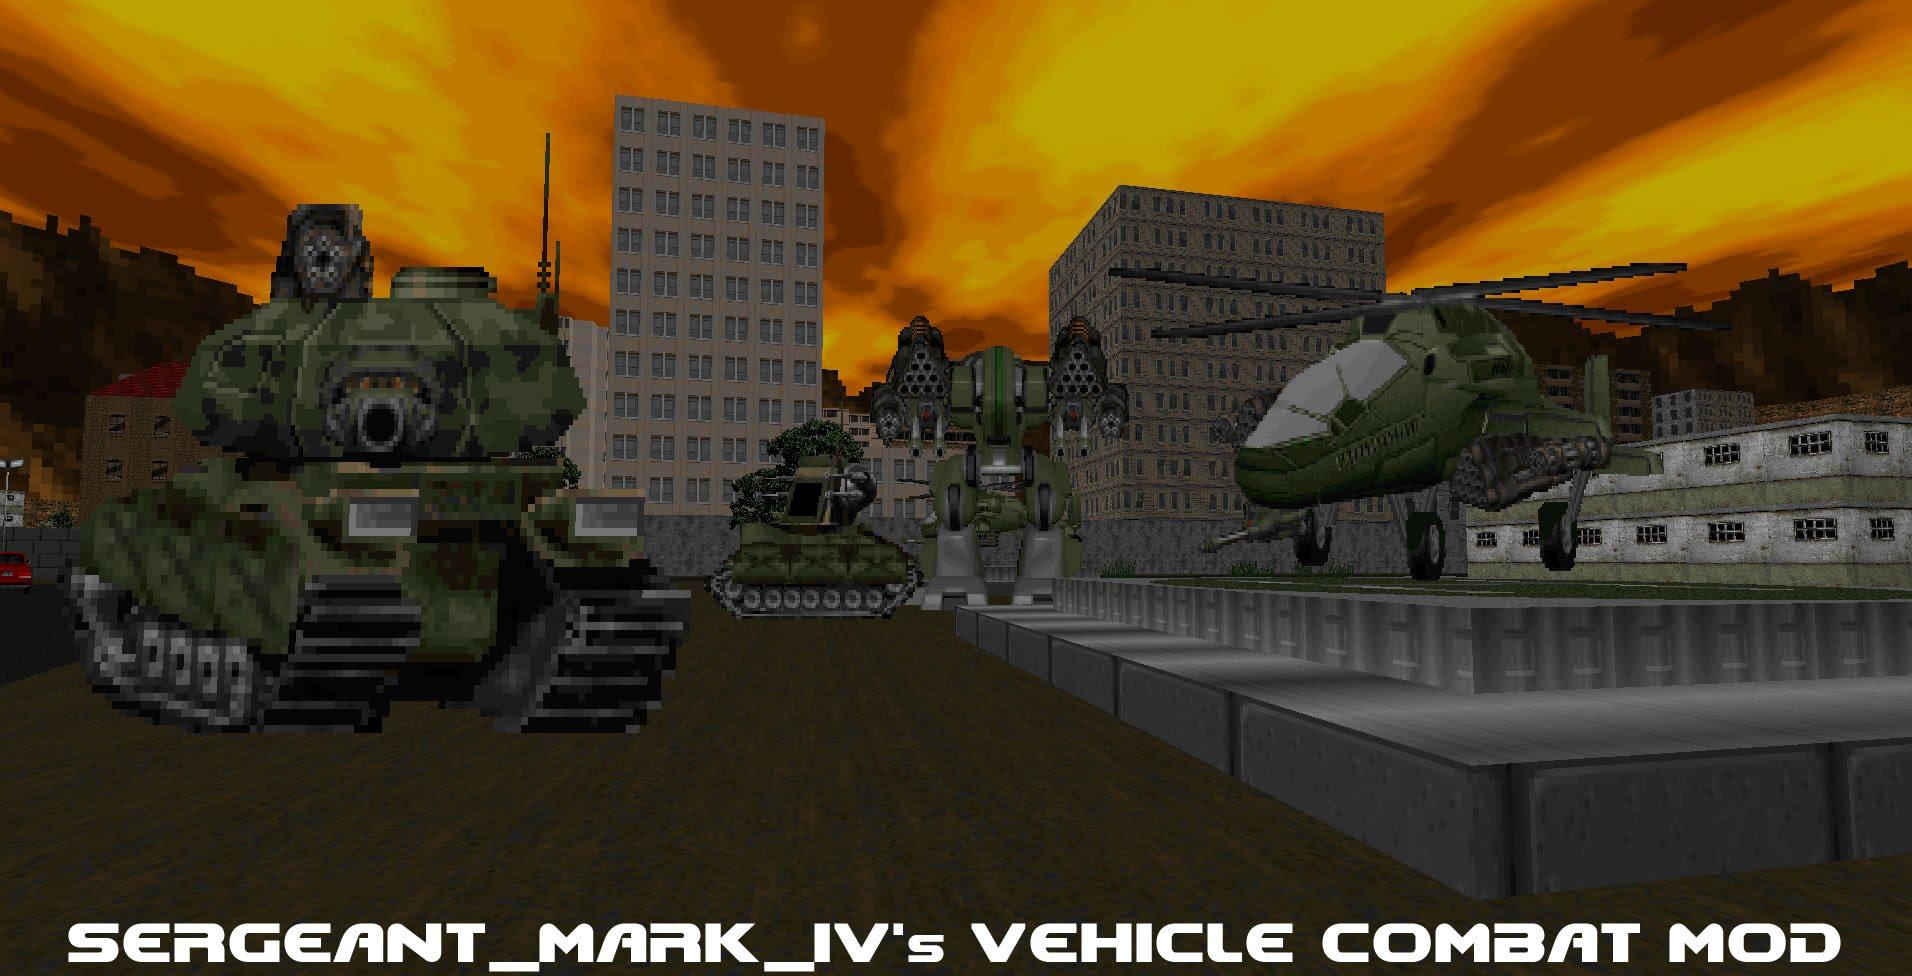 maxresdefault 1 image - Vehicle Combat mod for Doom II - Mod DB